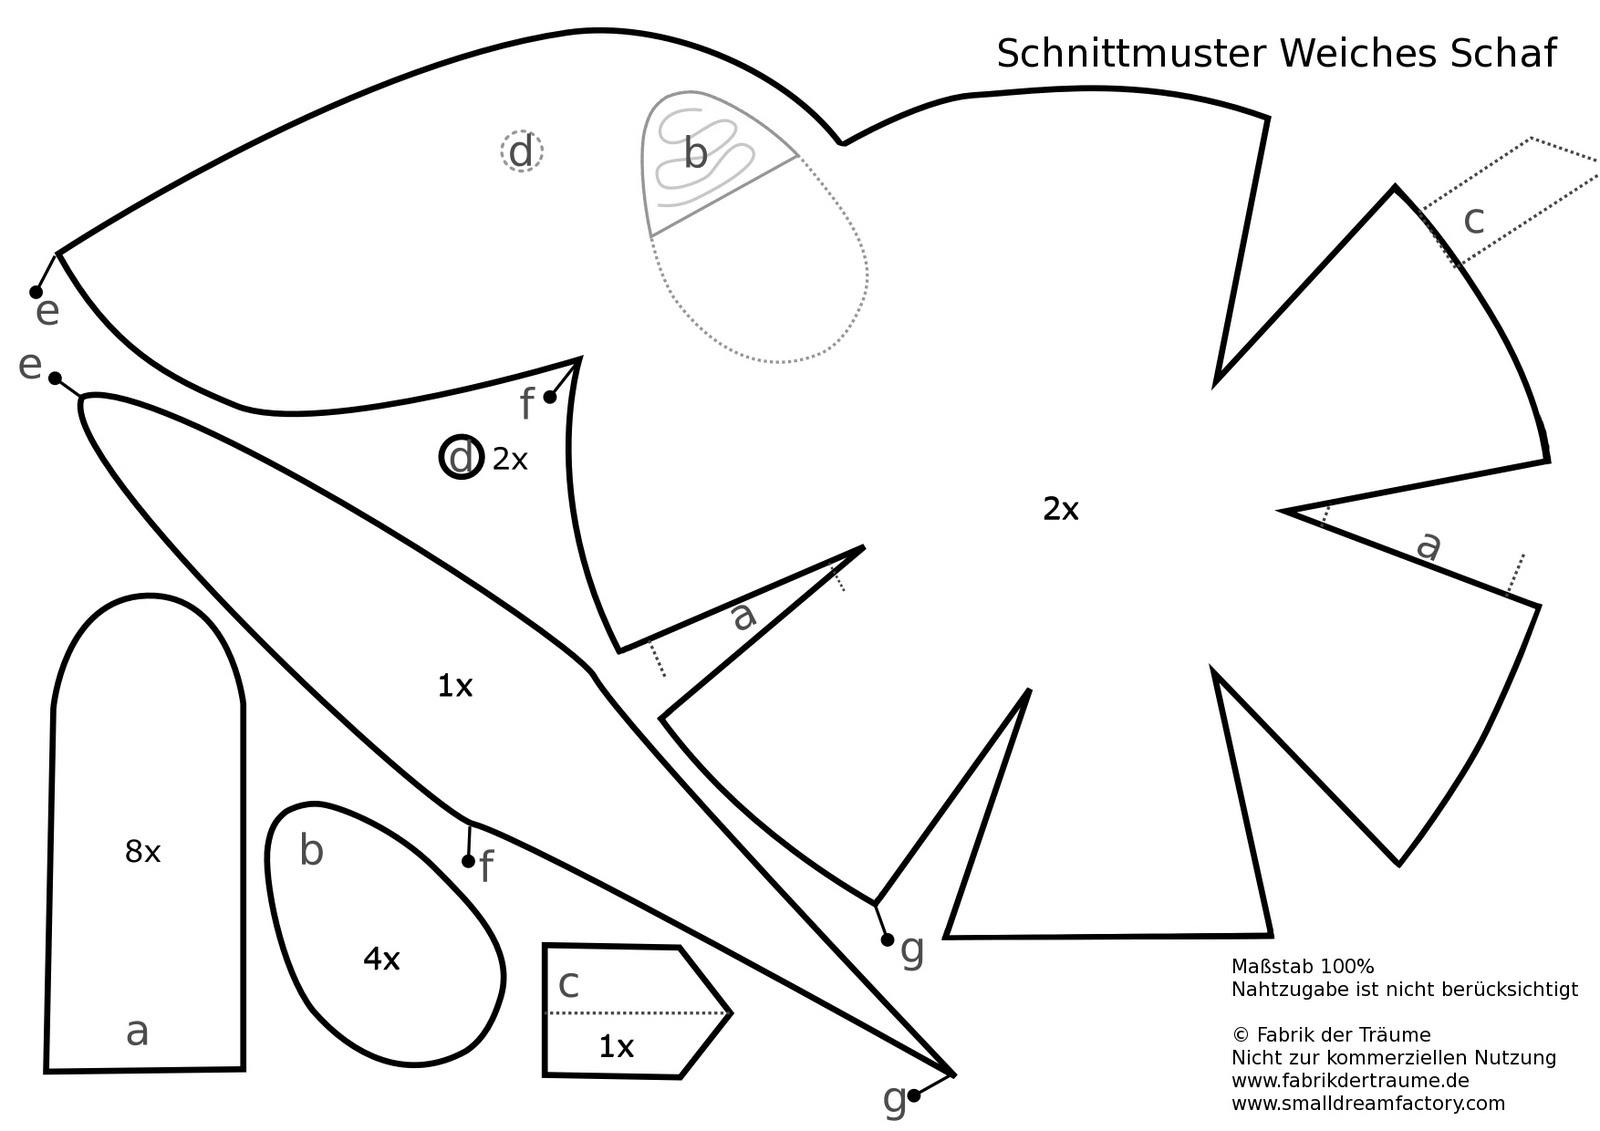 Fancy Schnittmuster Crest - Decke Stricken Muster - topacnetreatment.org